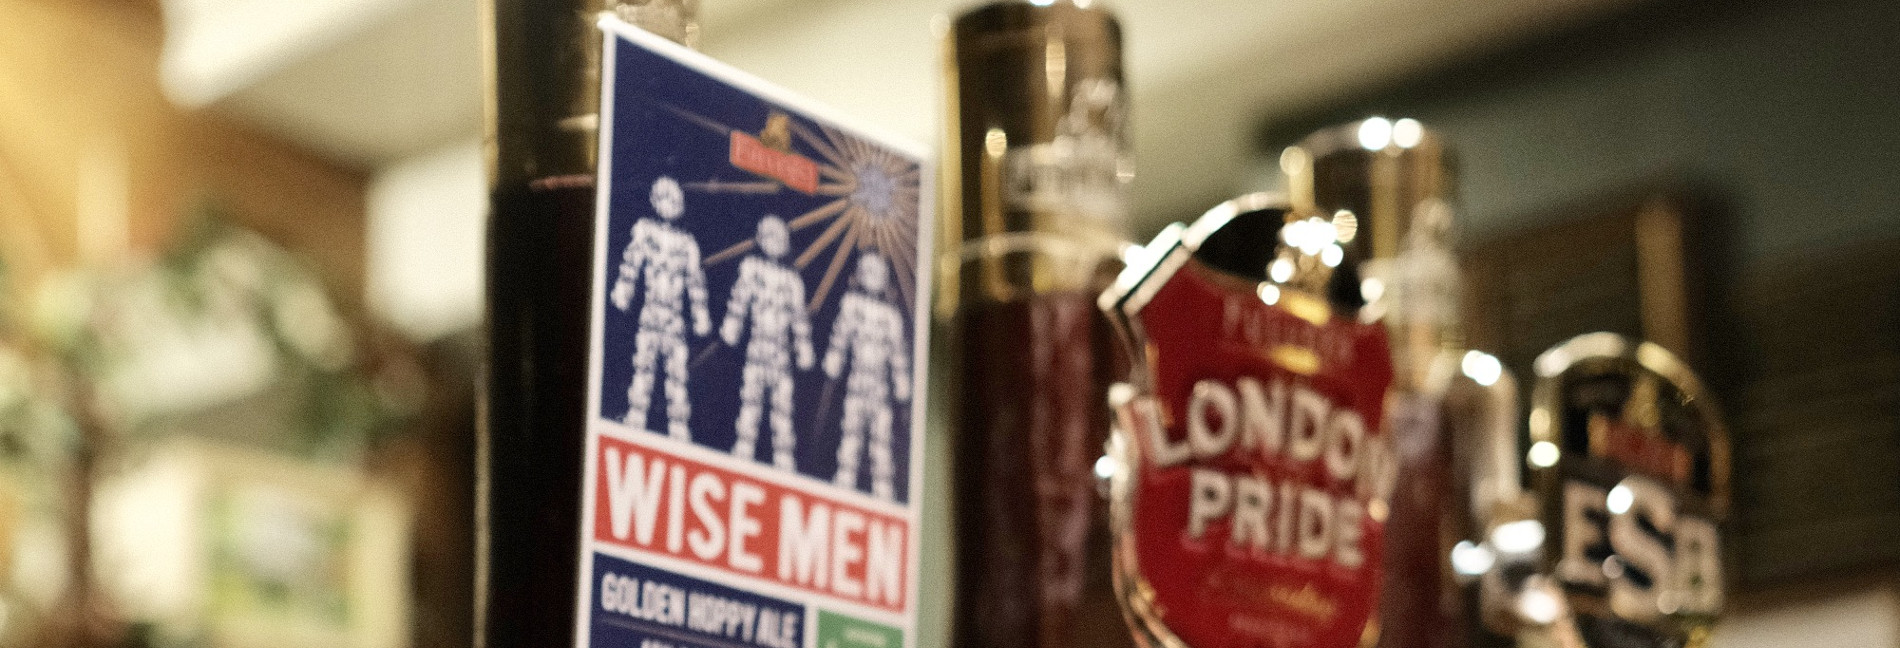 Wise Men back to raise money for Prostate Cancer UK